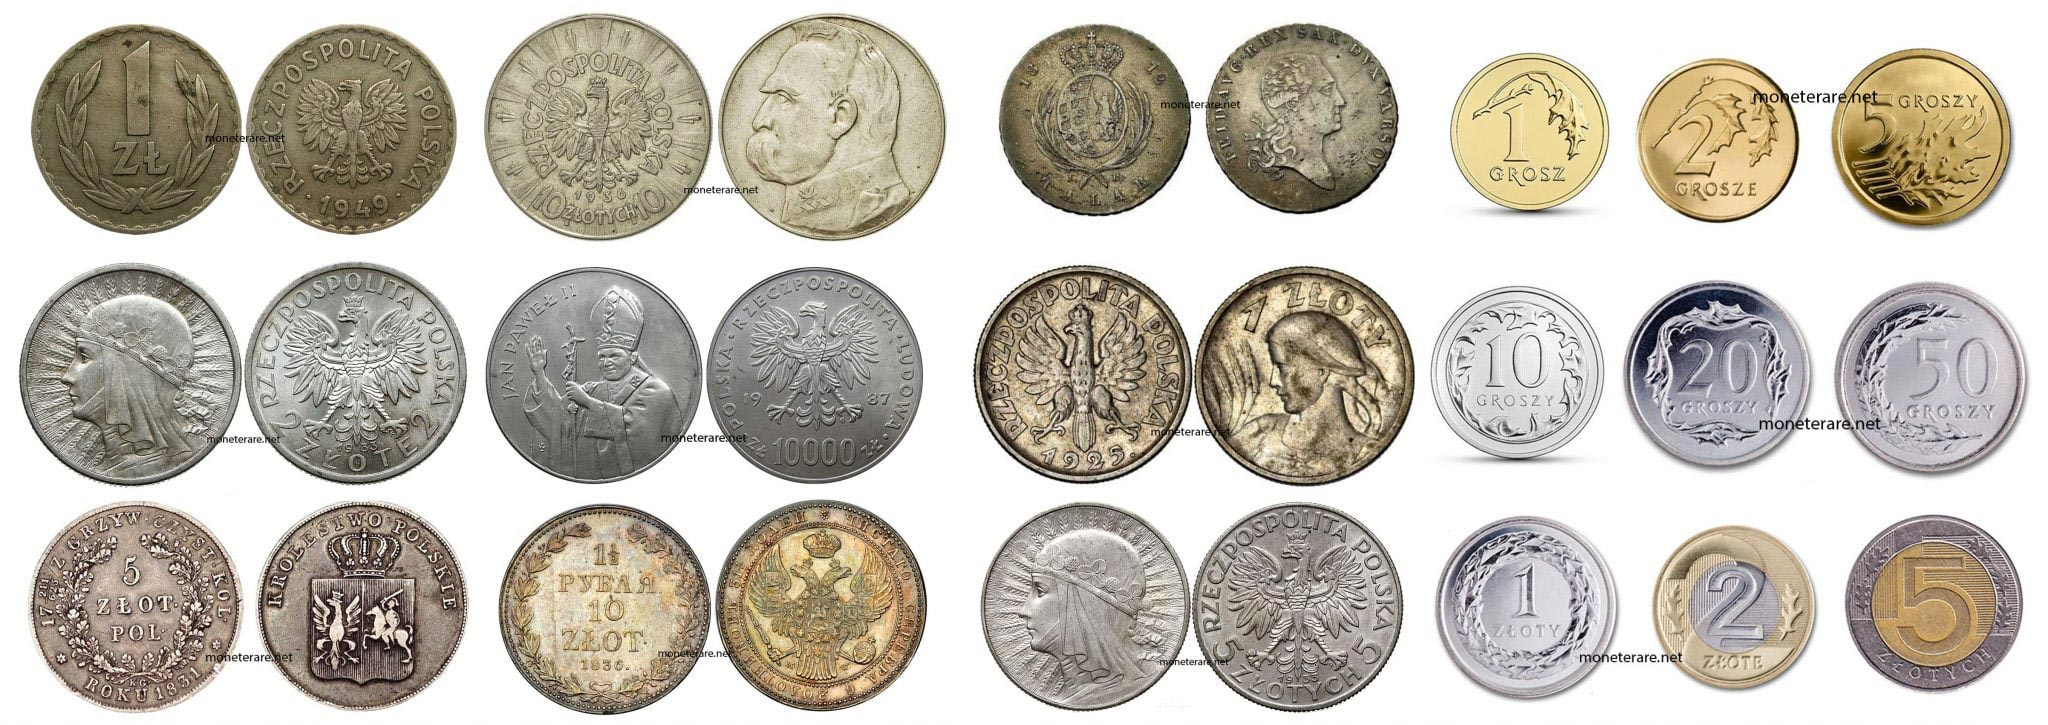 Moneta Polacca